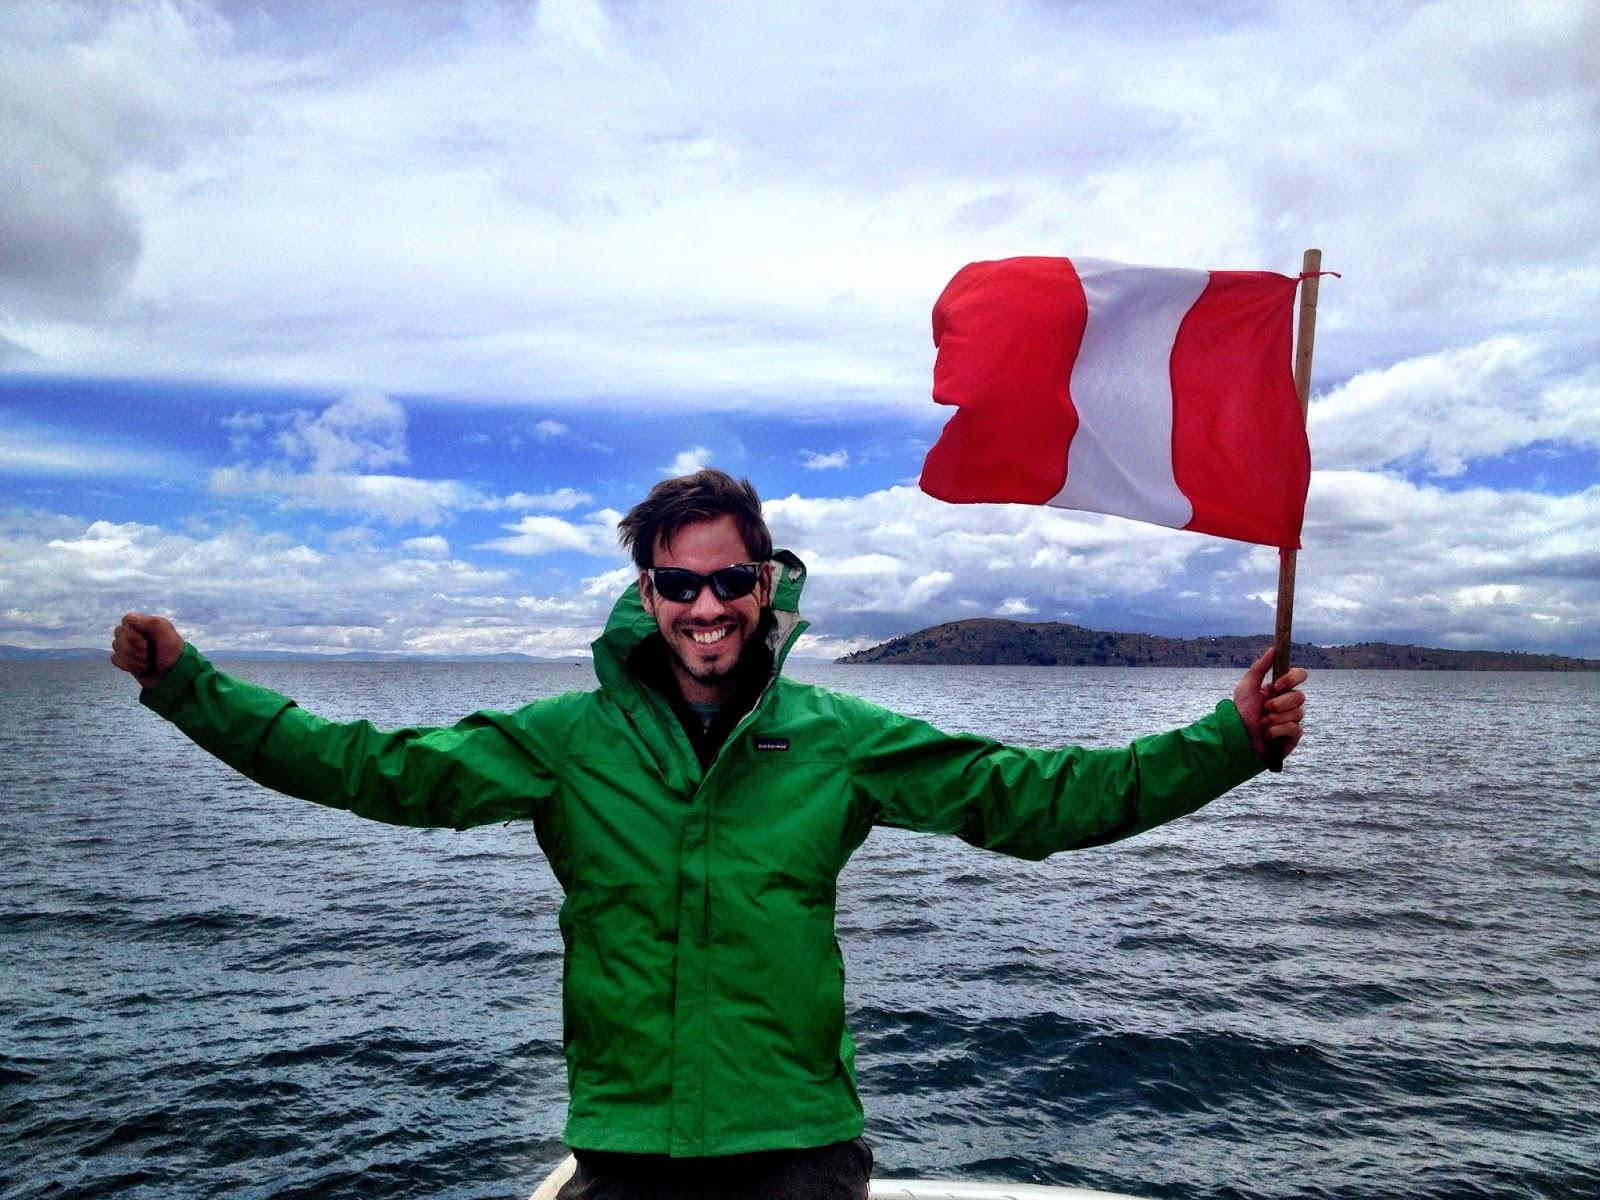 Heading towards Taquile Island, Lake Titicaca, Peru